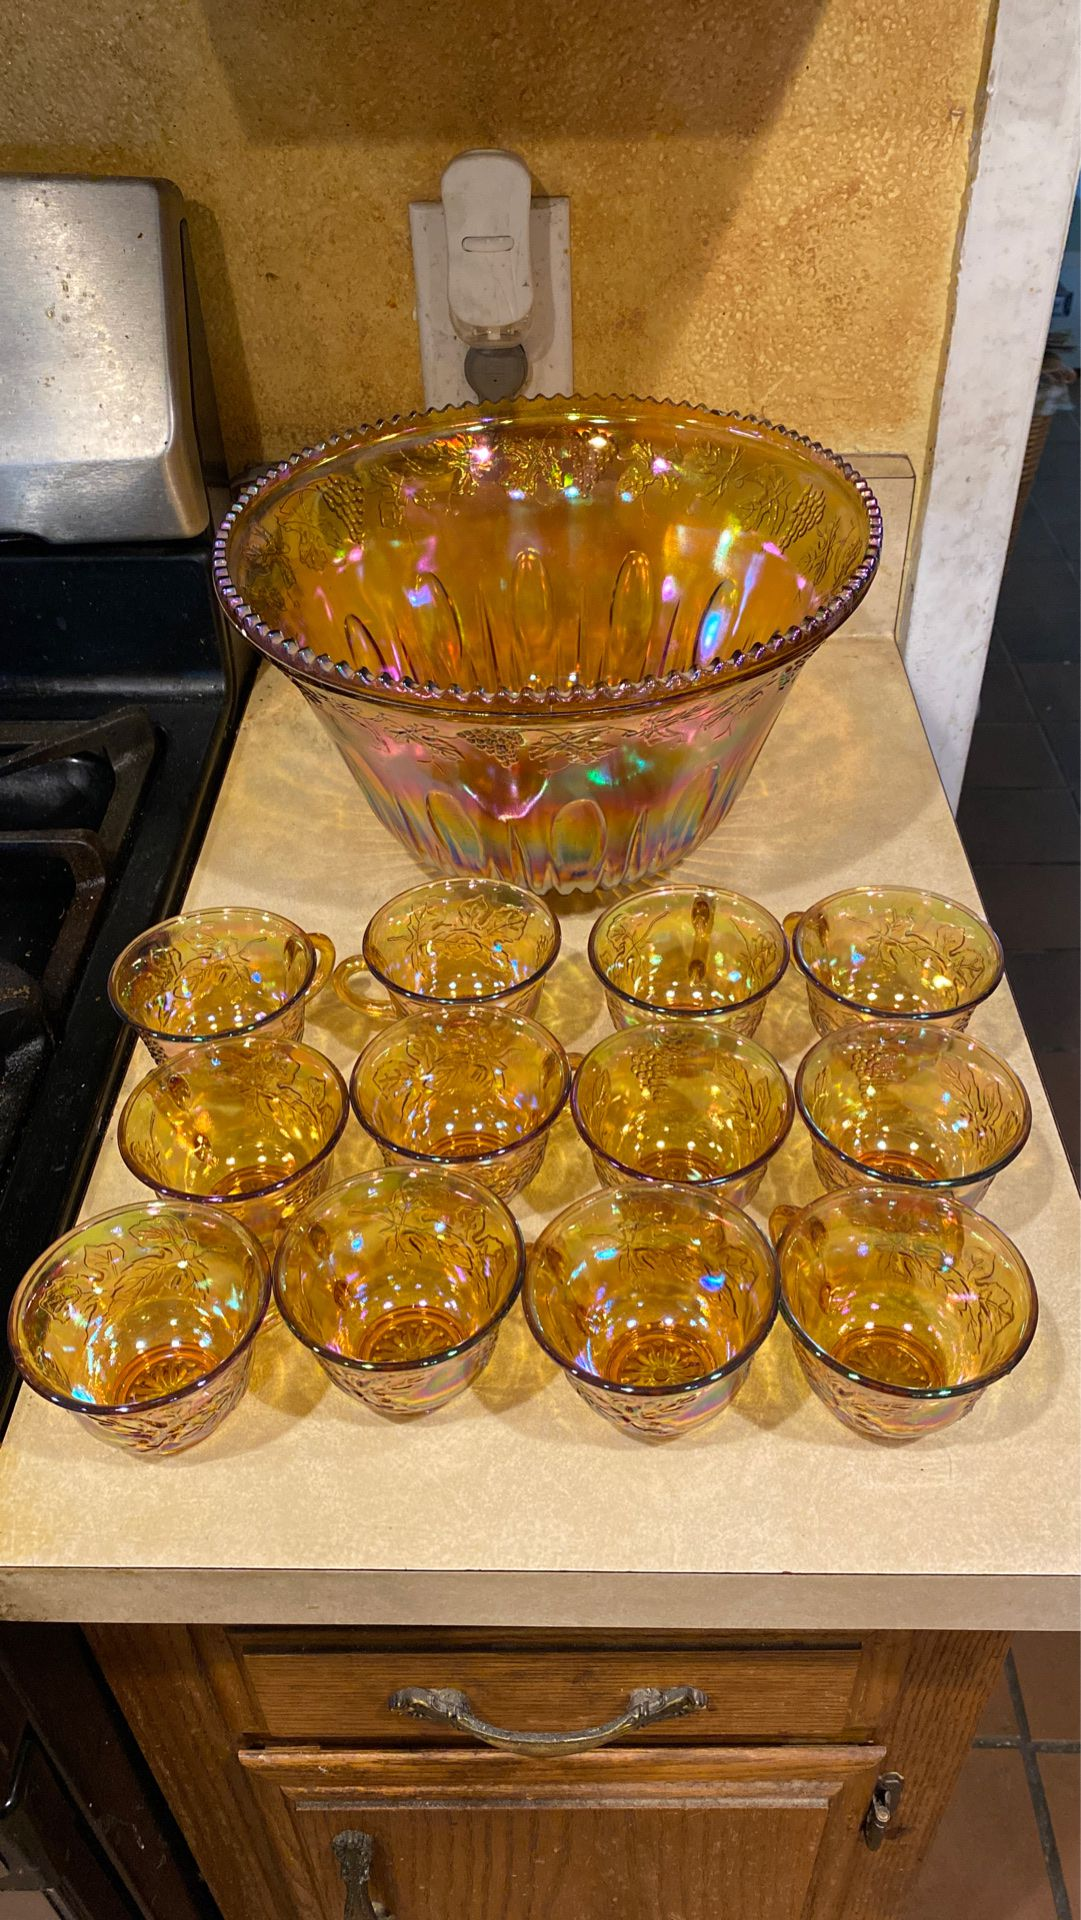 Antique marigold punch bowl at